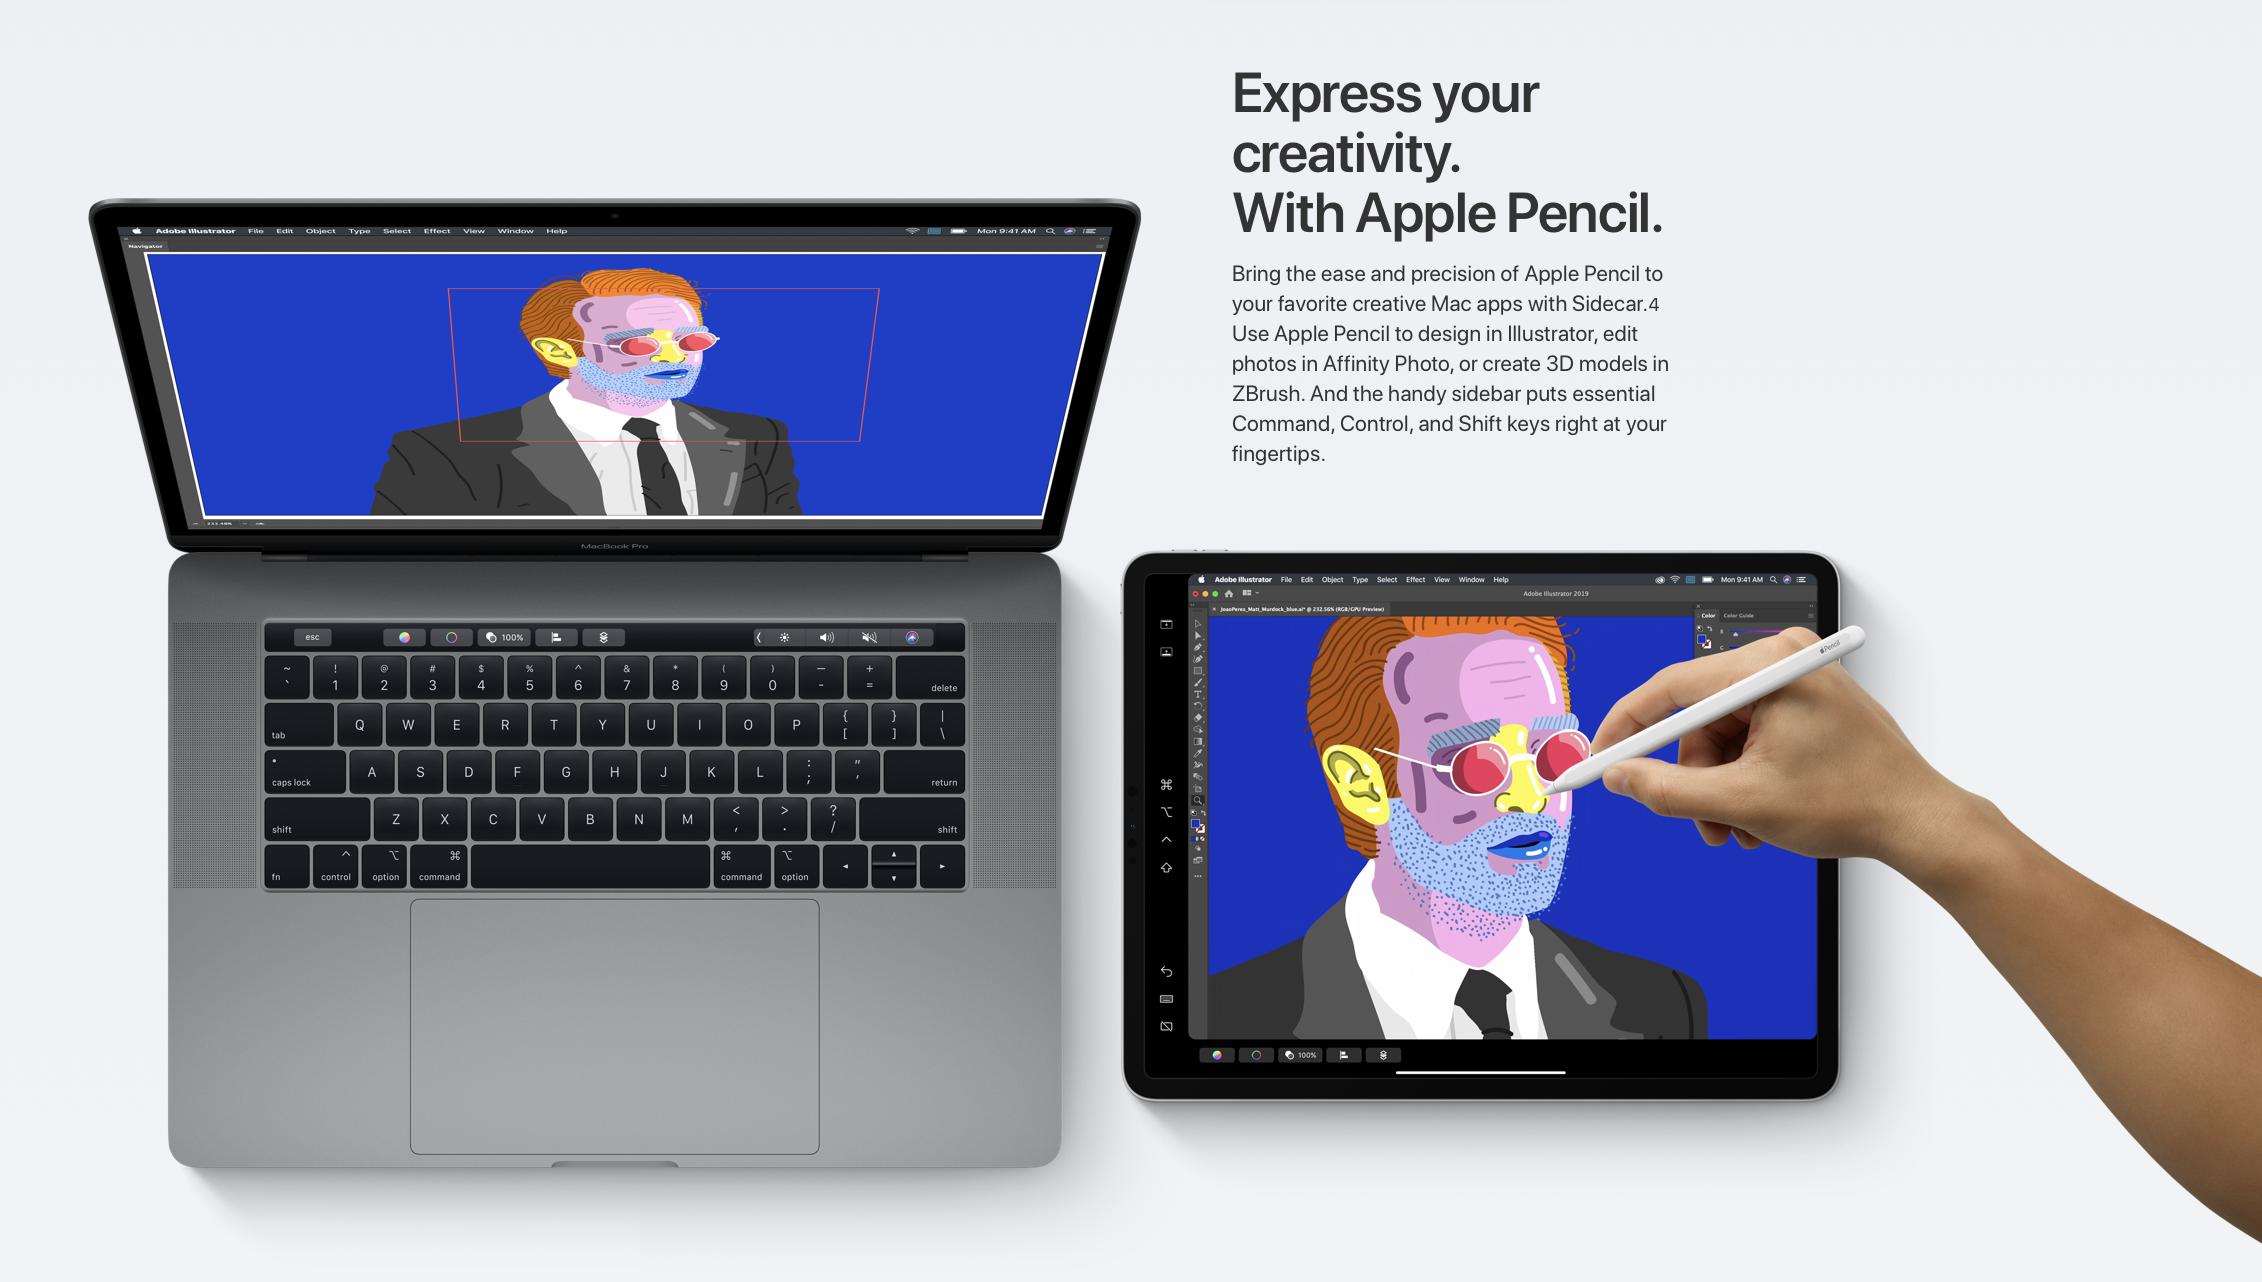 MacOS Catalina iPad as Second Display